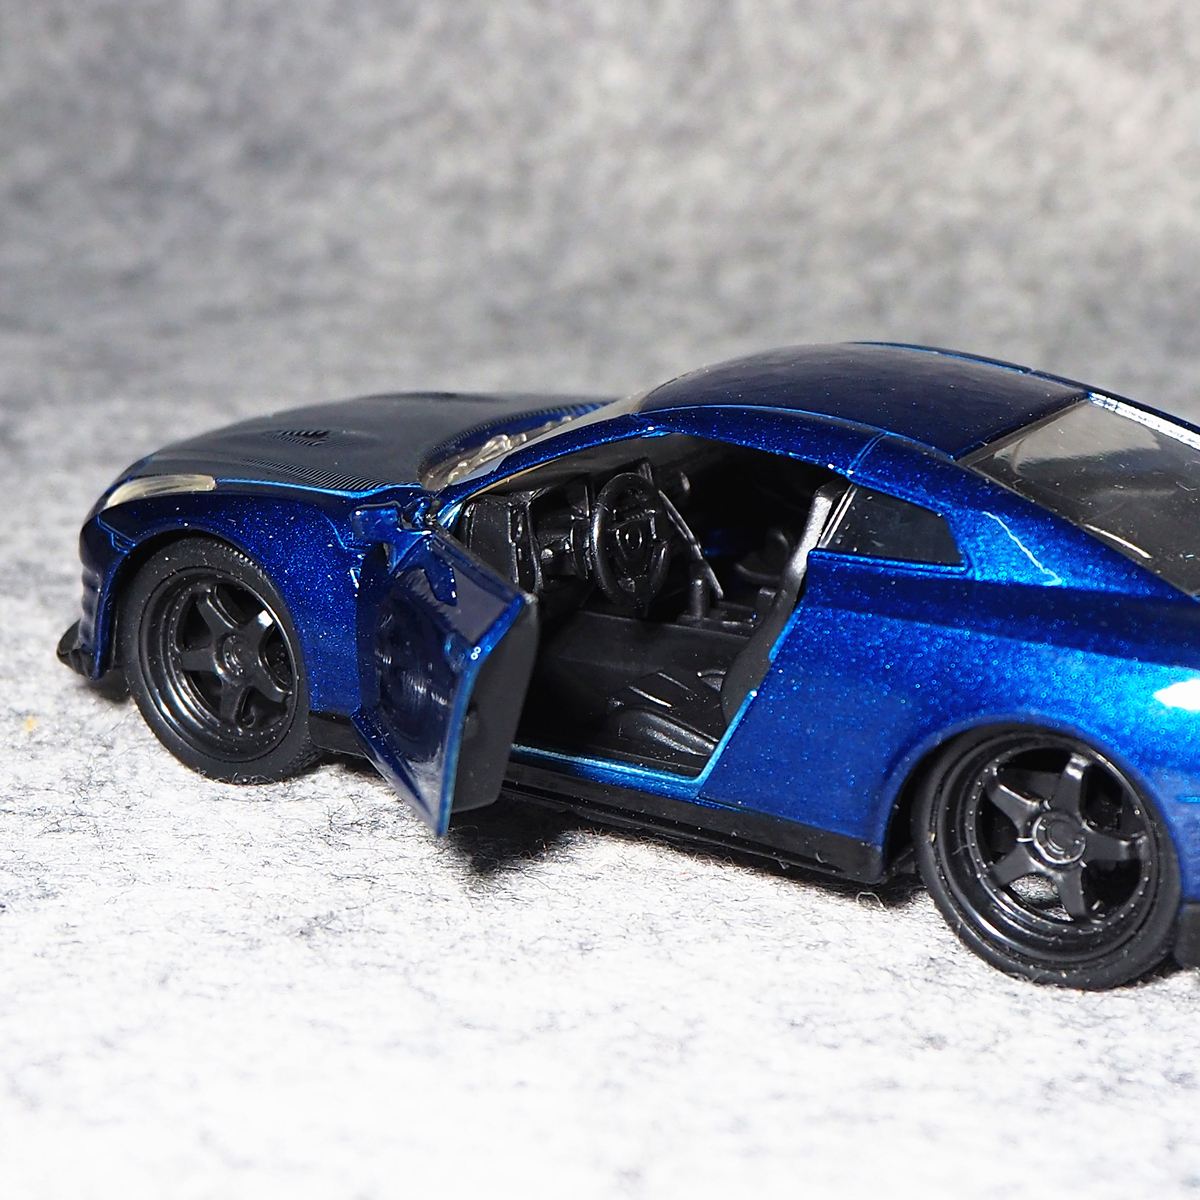 Fast Juguete Modelo 132 Para Escala Juguetes Jada Nissan Coche Gtr Furious De Metal RegaloNiñosColección Diecast LzVMqSGUjp